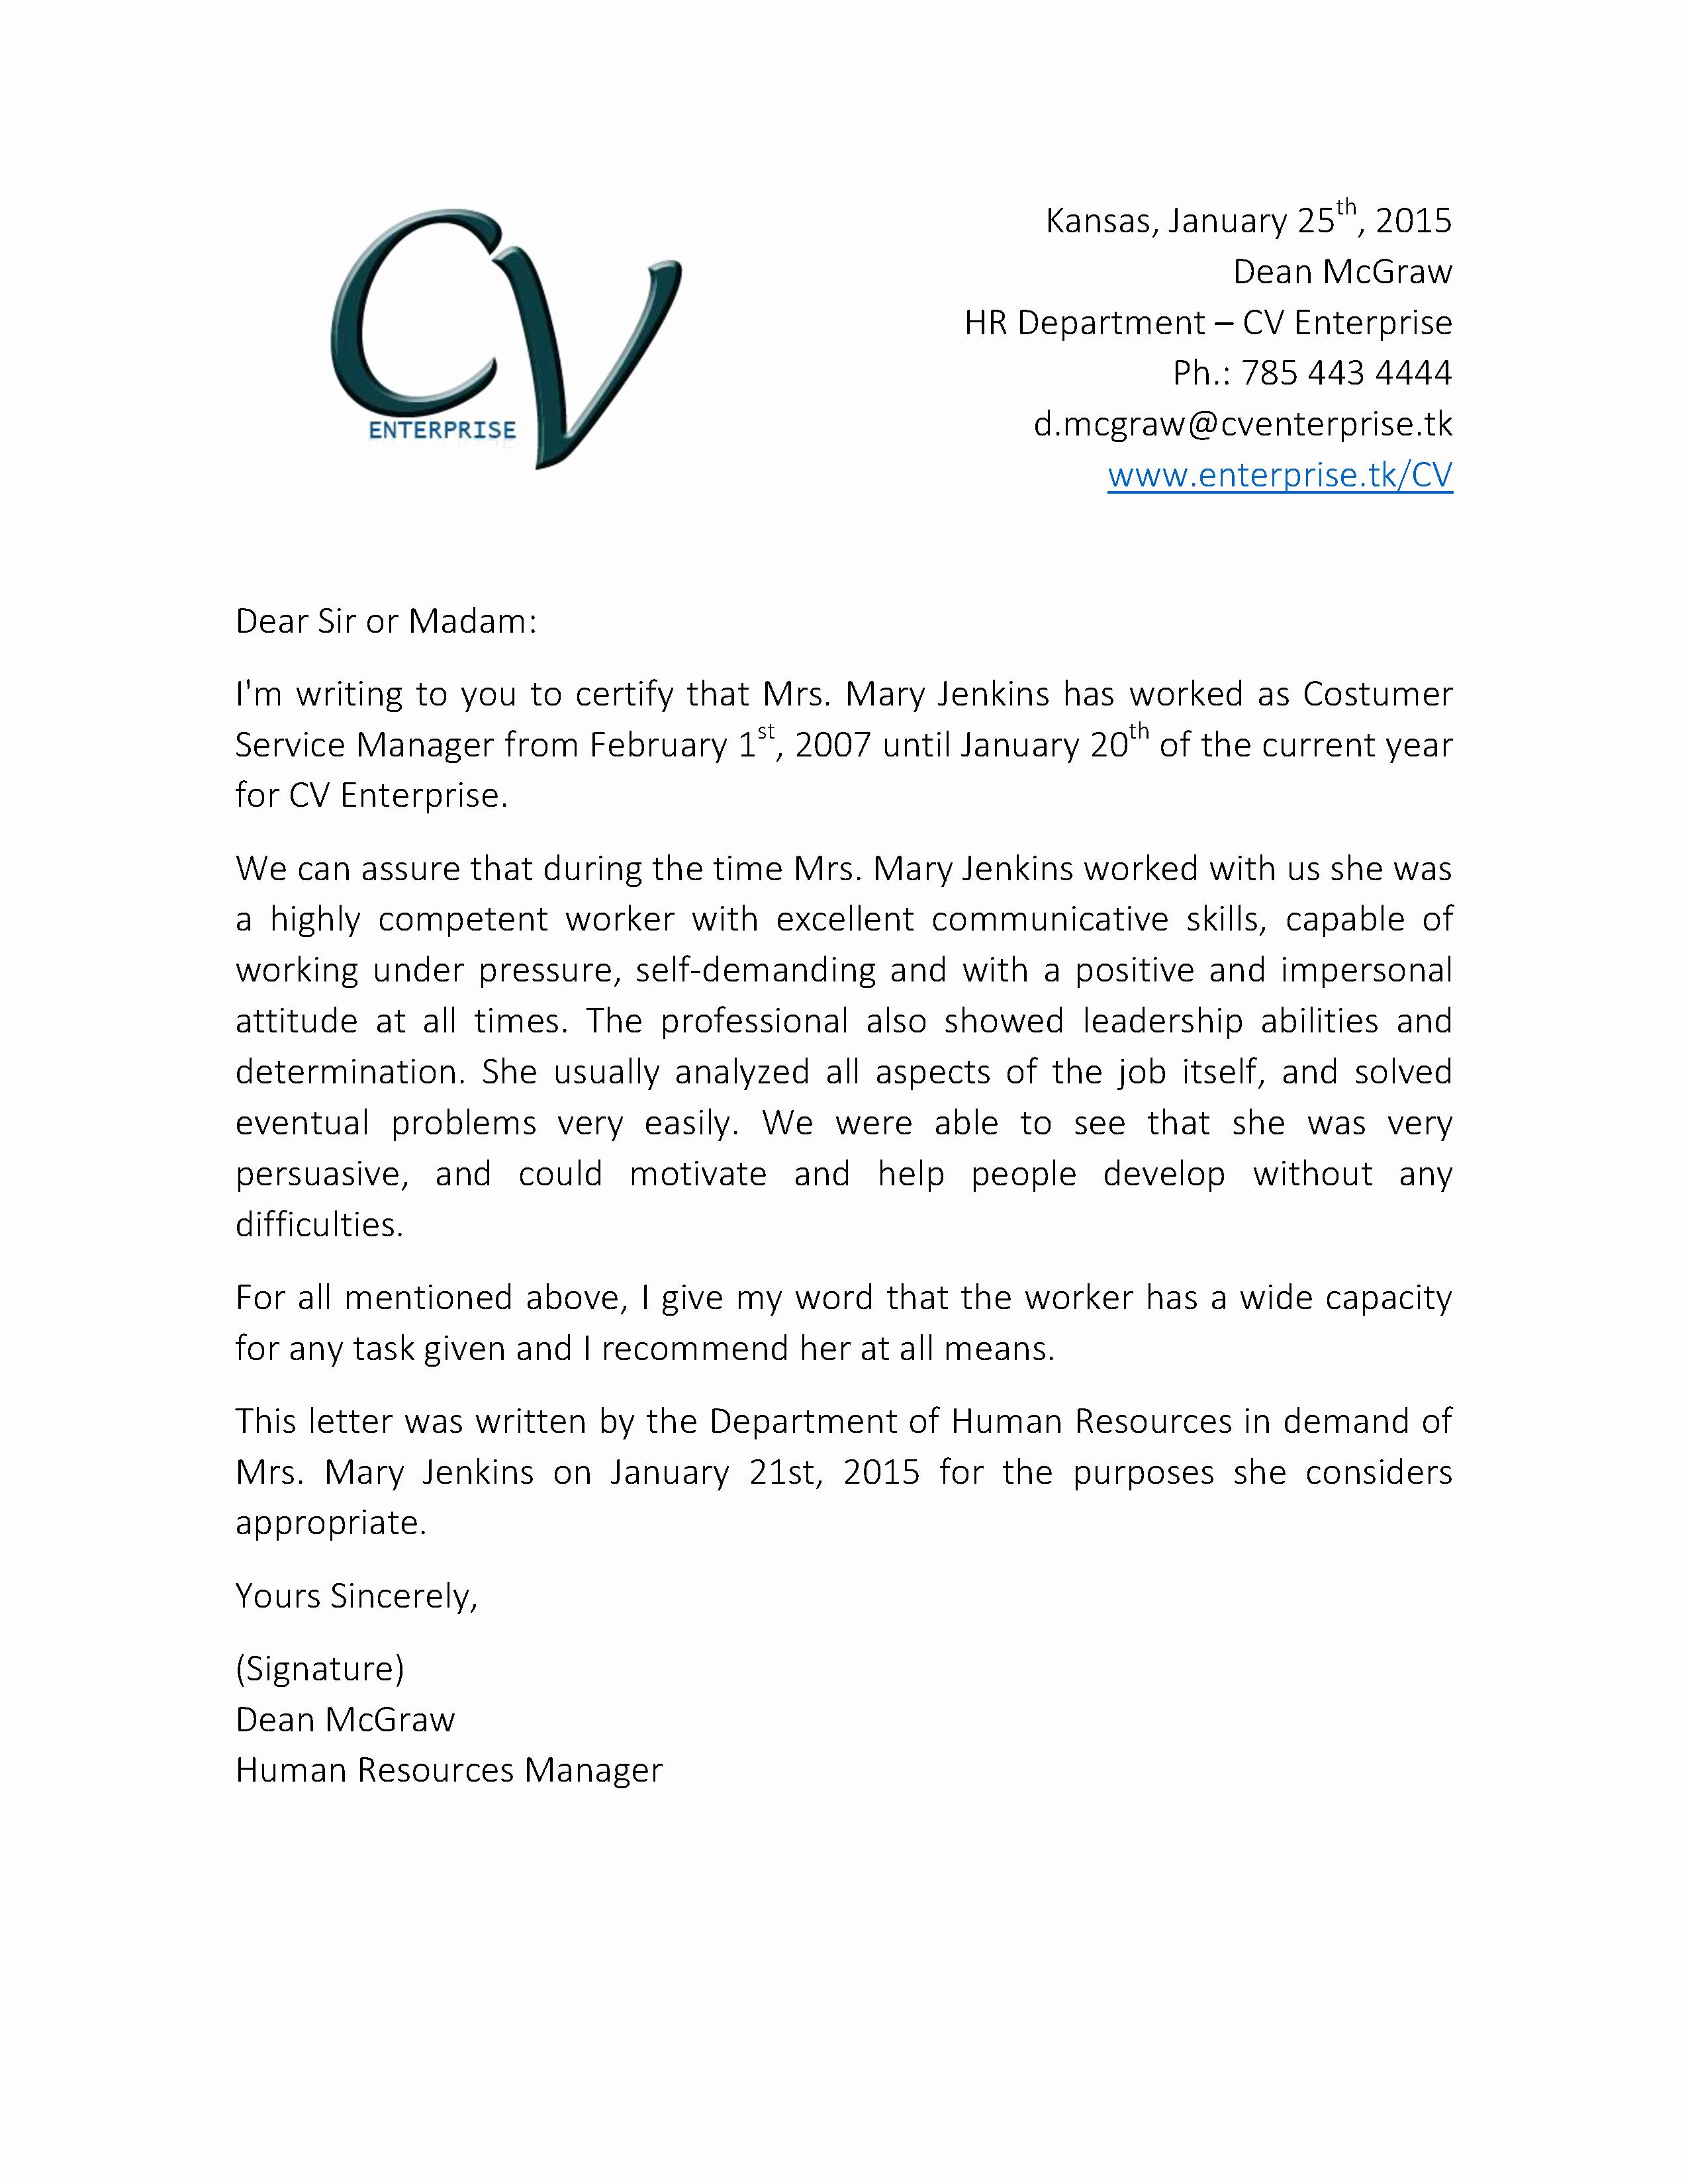 Customer Service Recommendation Letter Elegant Re Mendation Letter for Customer Service Job 2 Grow